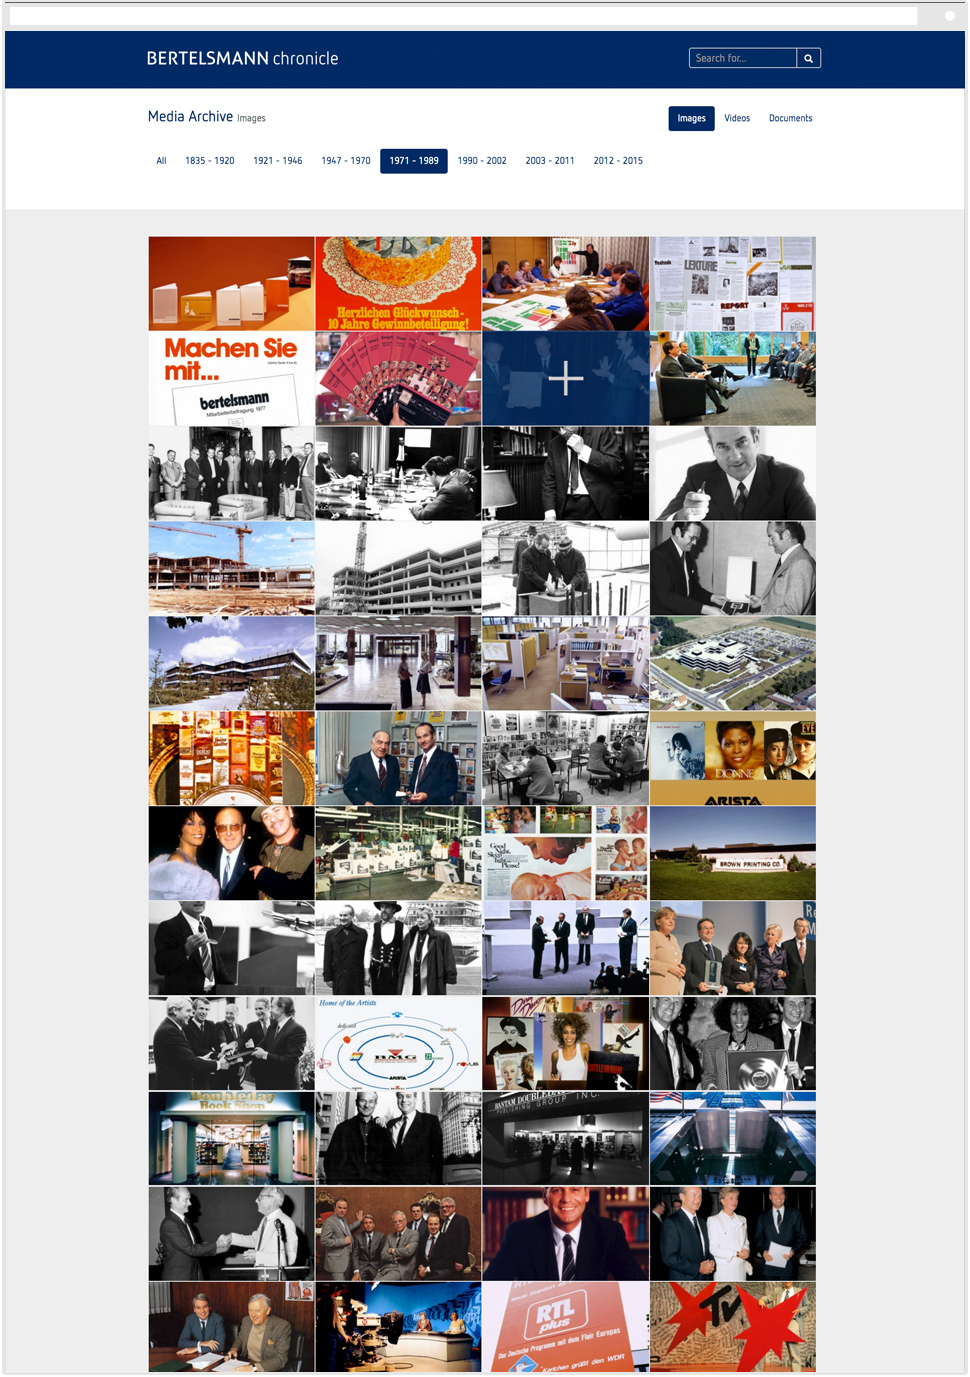 rrrrw-project-content-bchronik06-10col-970